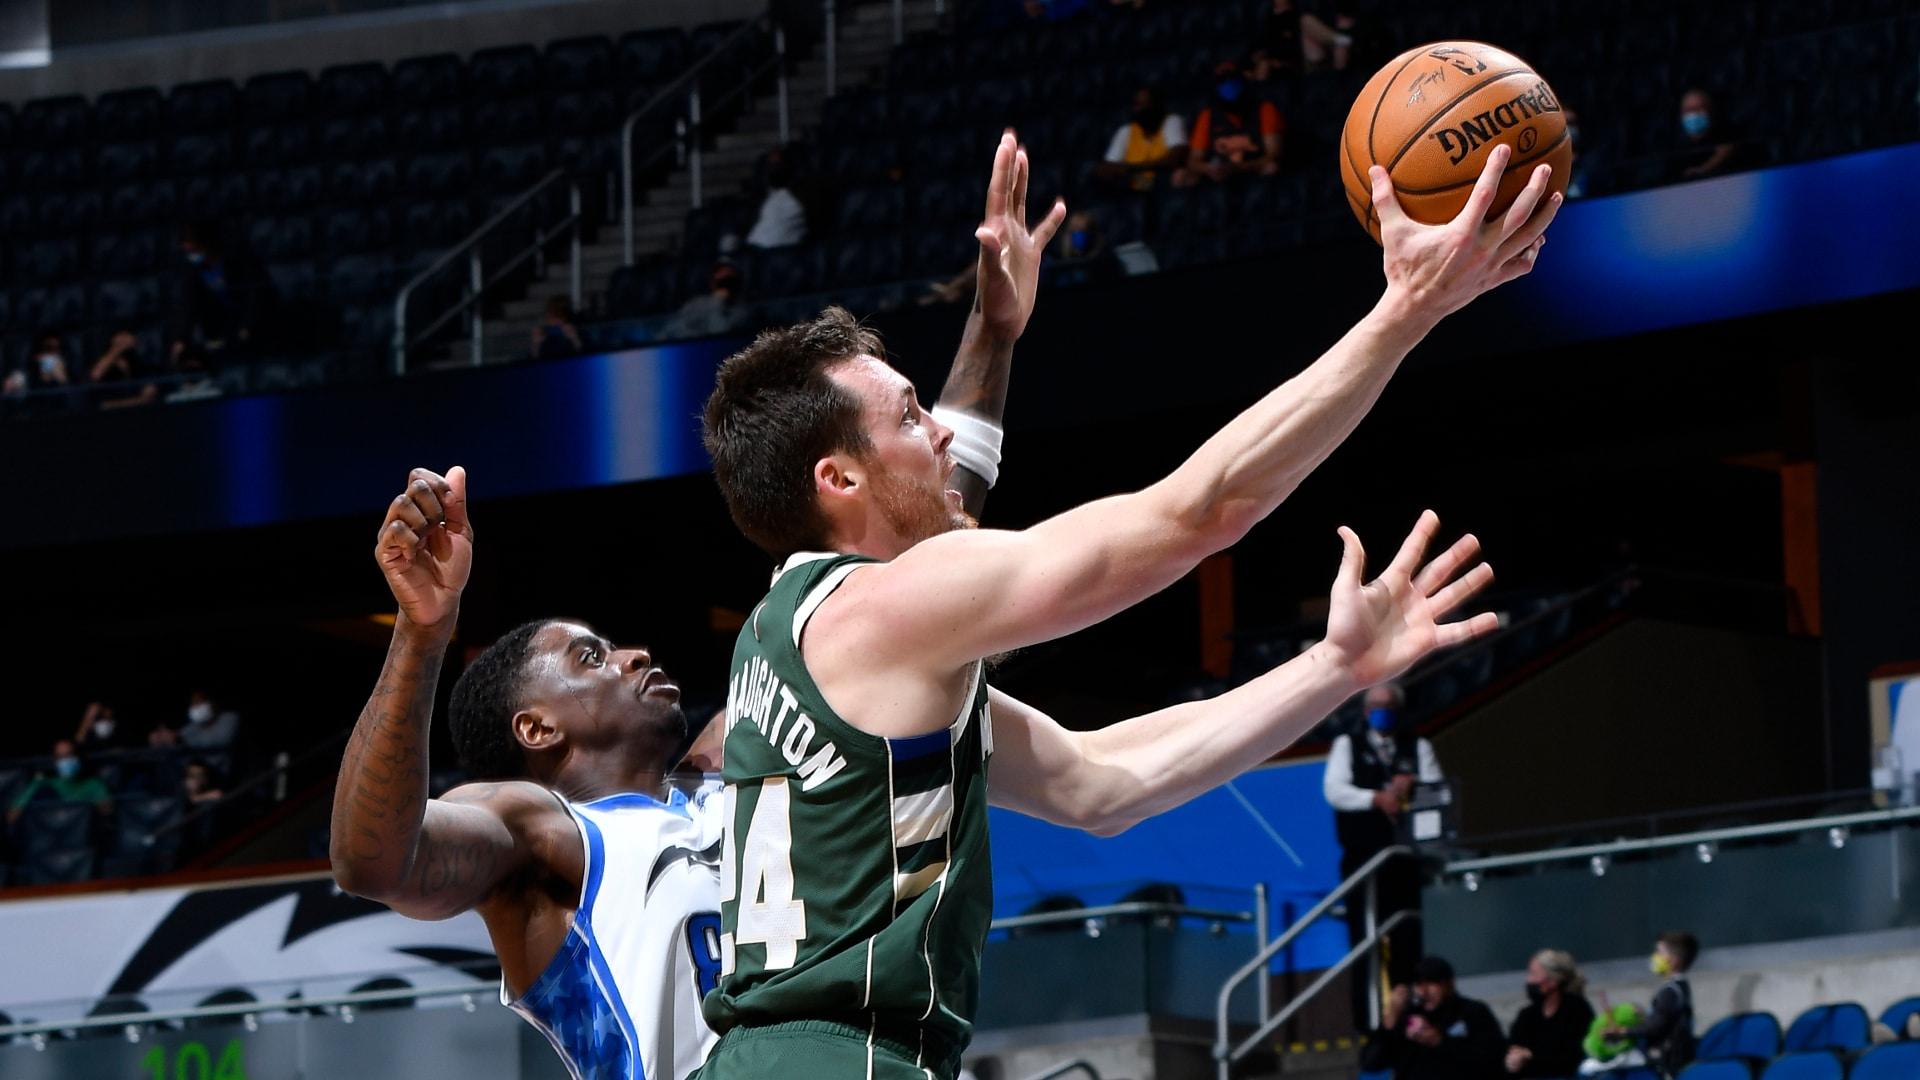 Game Recap: Bucks 124, Magic 87